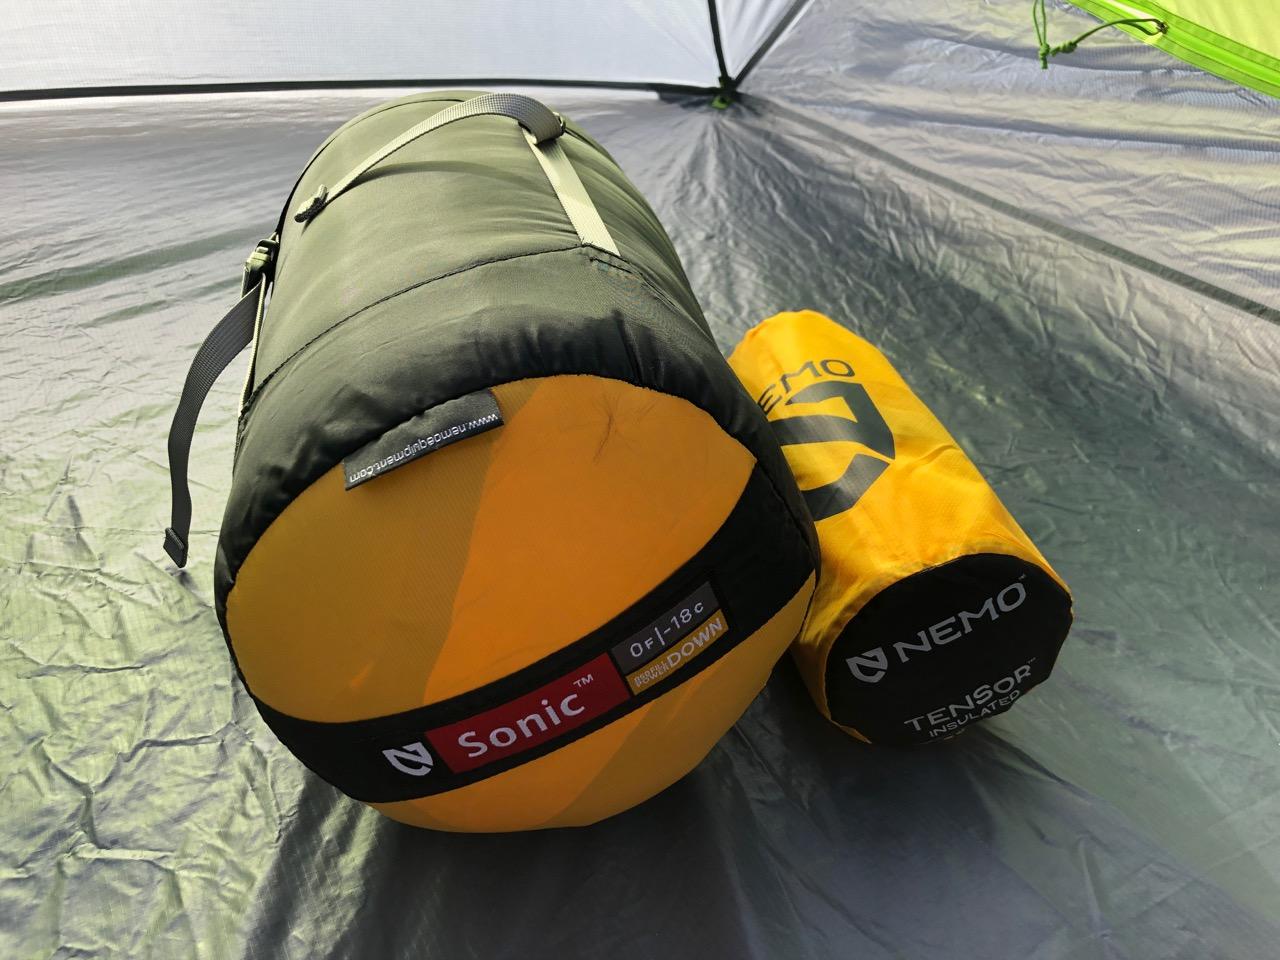 NEMO Tensor Regular Insulated Ultralight Sleeping Pad (2019) Next To Sonic 0 Degree Sleeping Bag